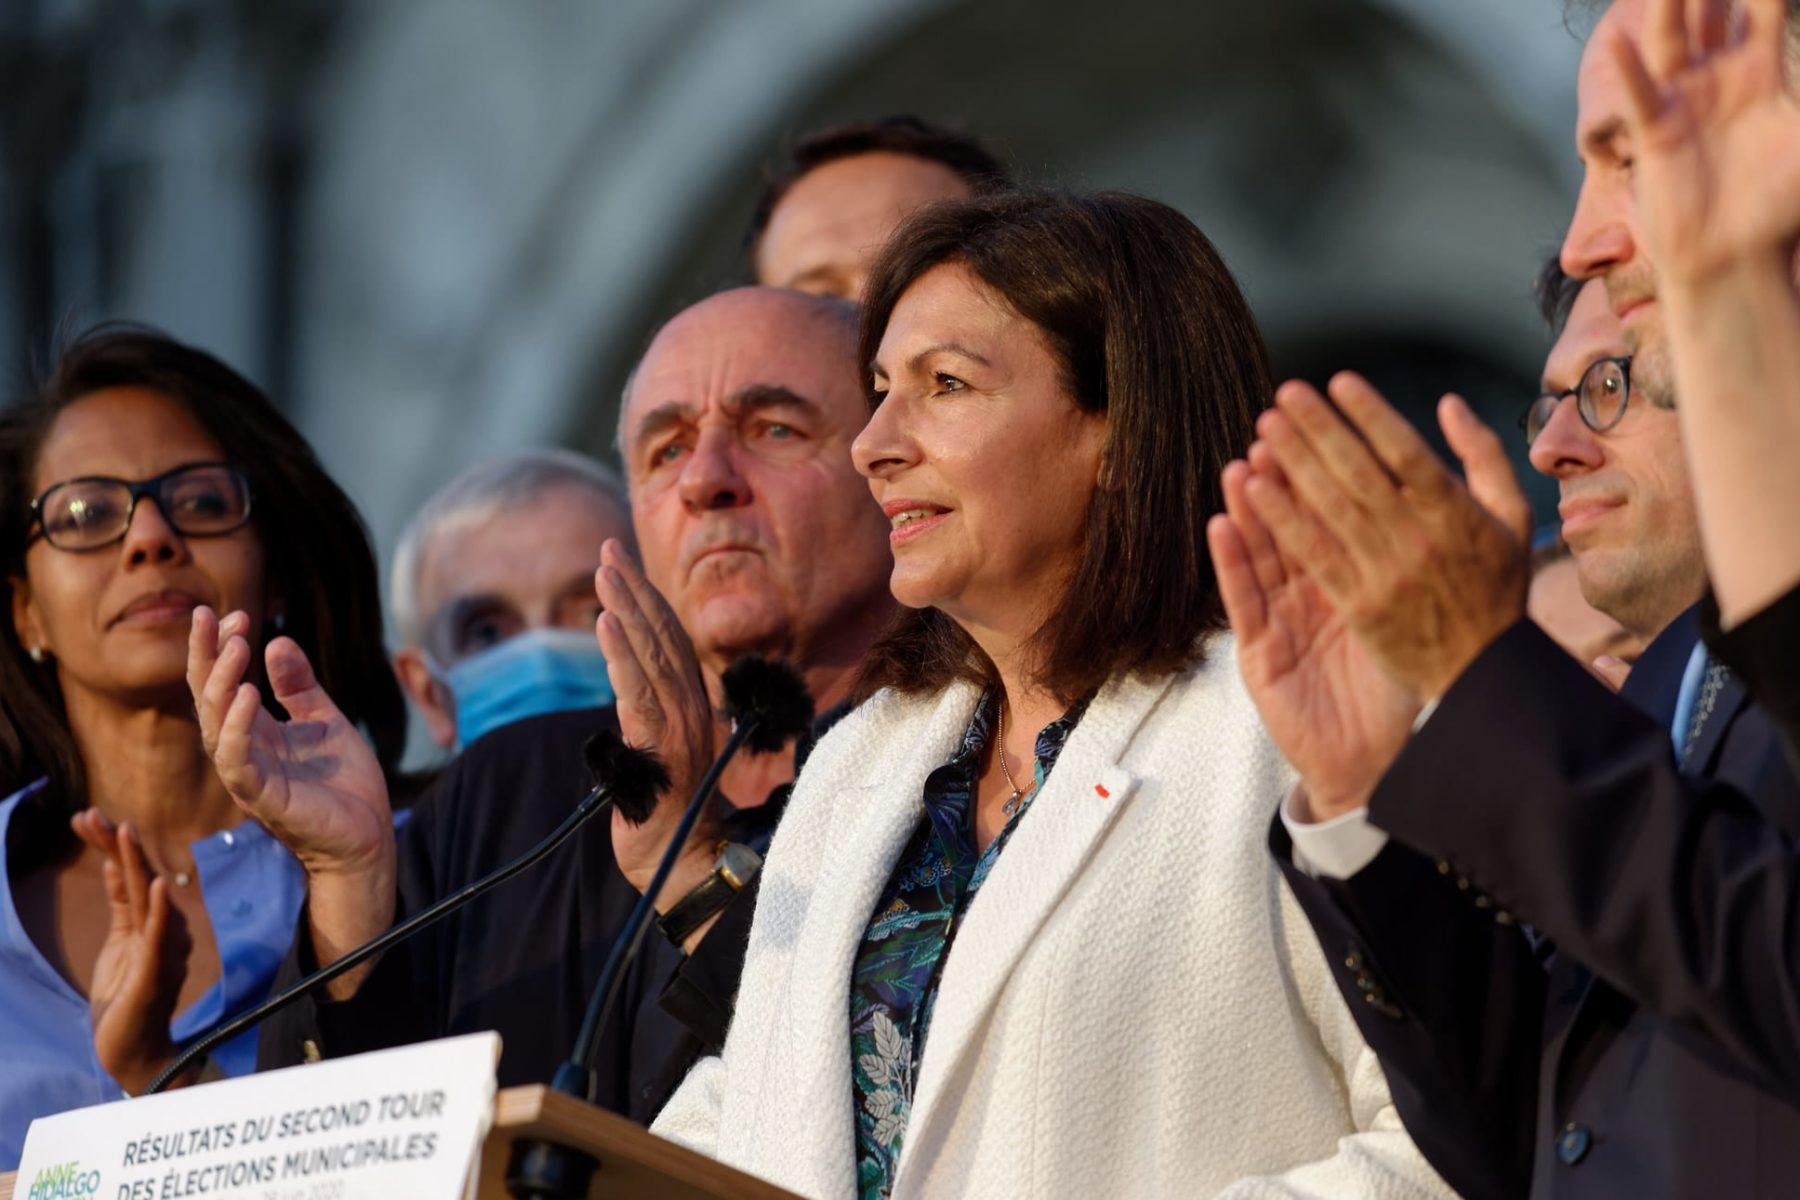 Paris Mayor Anne Hidalgo stands at a podium.